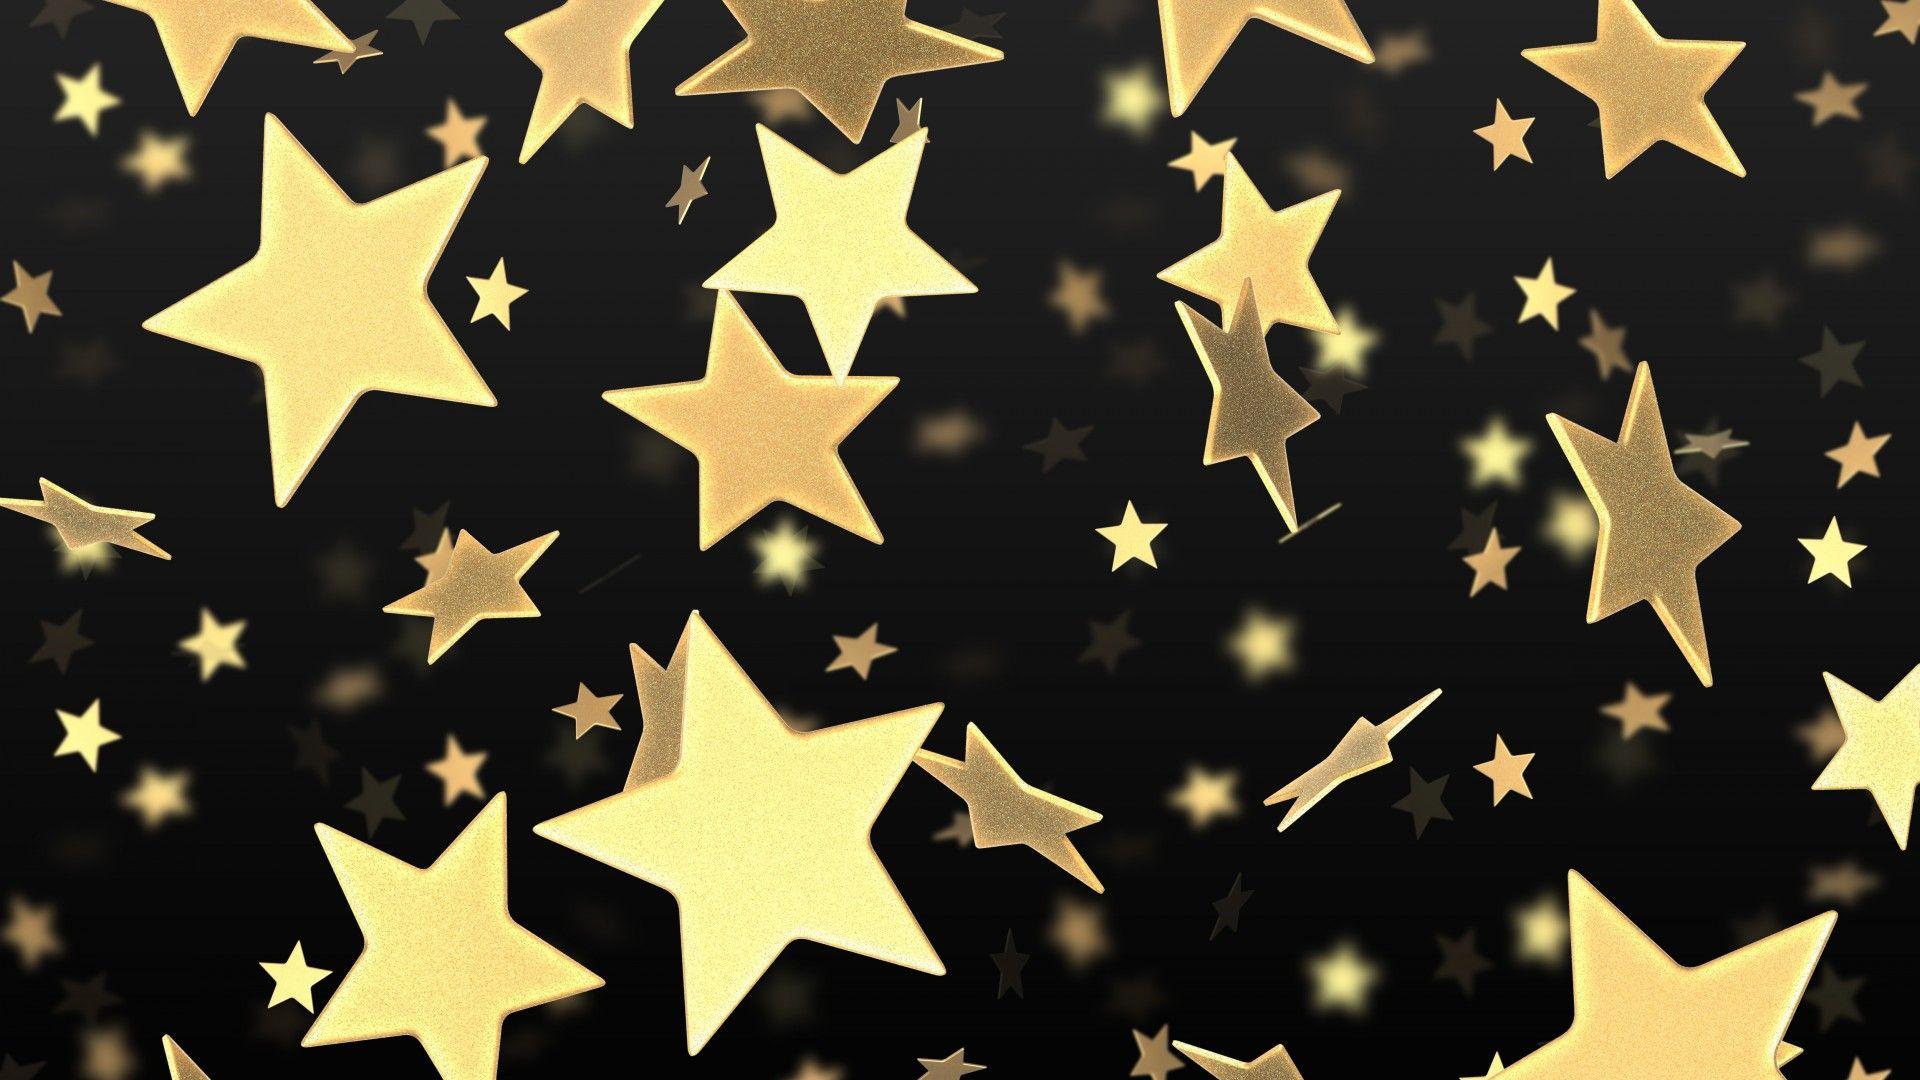 Download 1920x1080 Full Hd 1080p 1080i Star Flying Gold Wallpaper